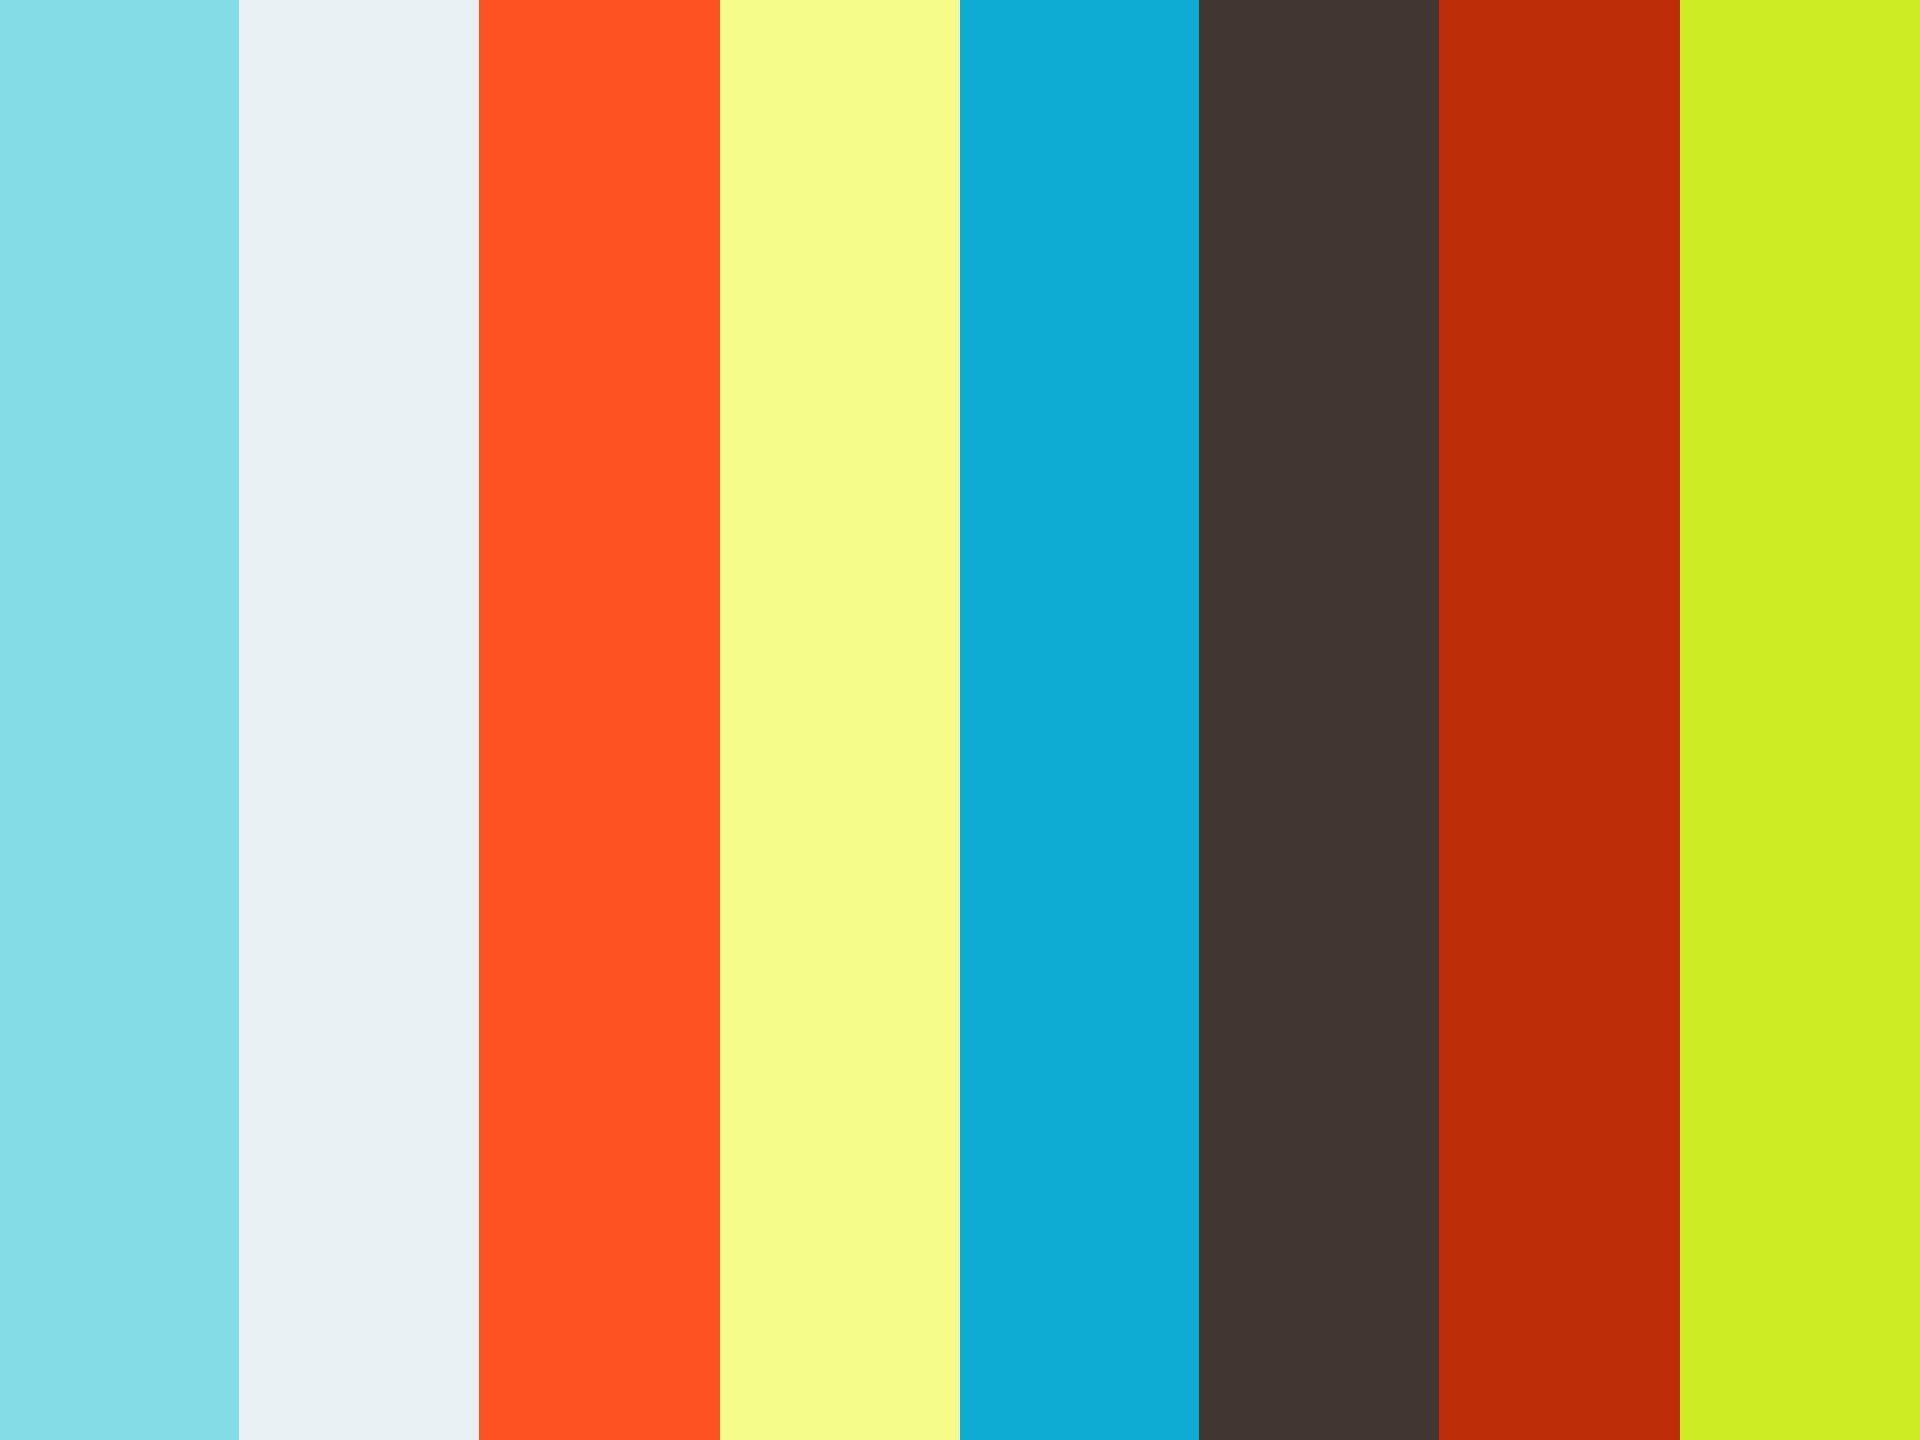 AUDI A5 - BLACK - 2015